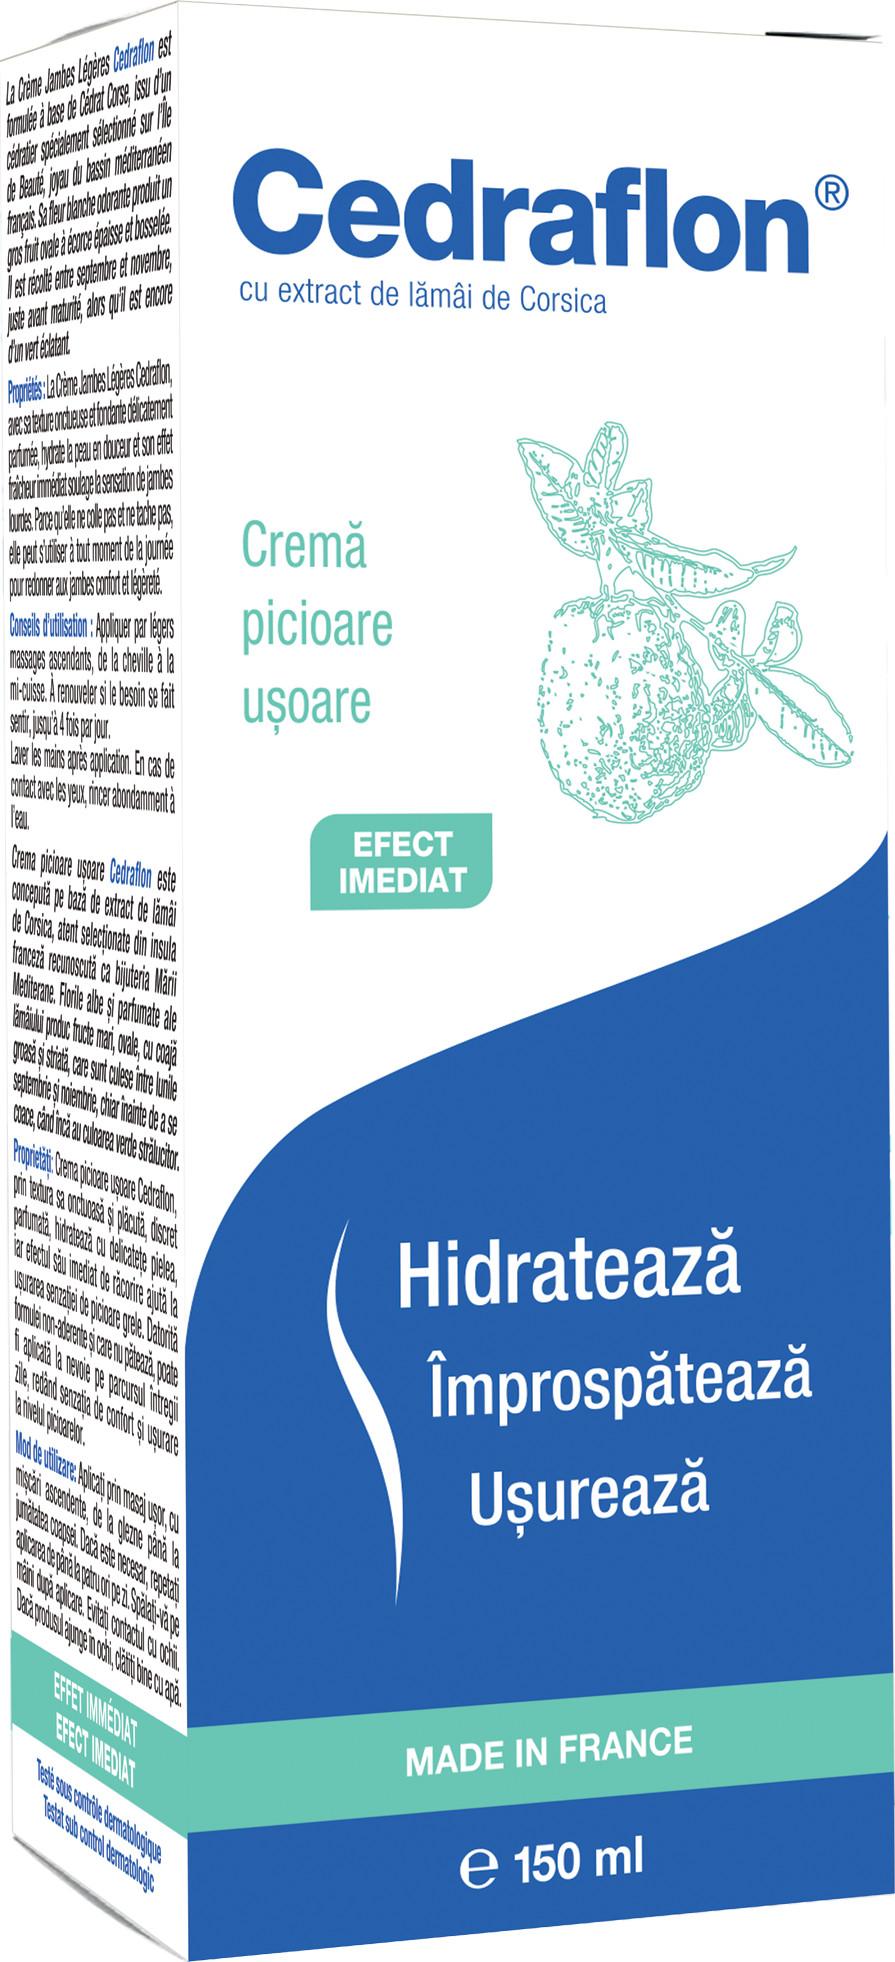 Crema pentru picioare Cedraflon, 150 ml, Servier Healthcare drmax.ro